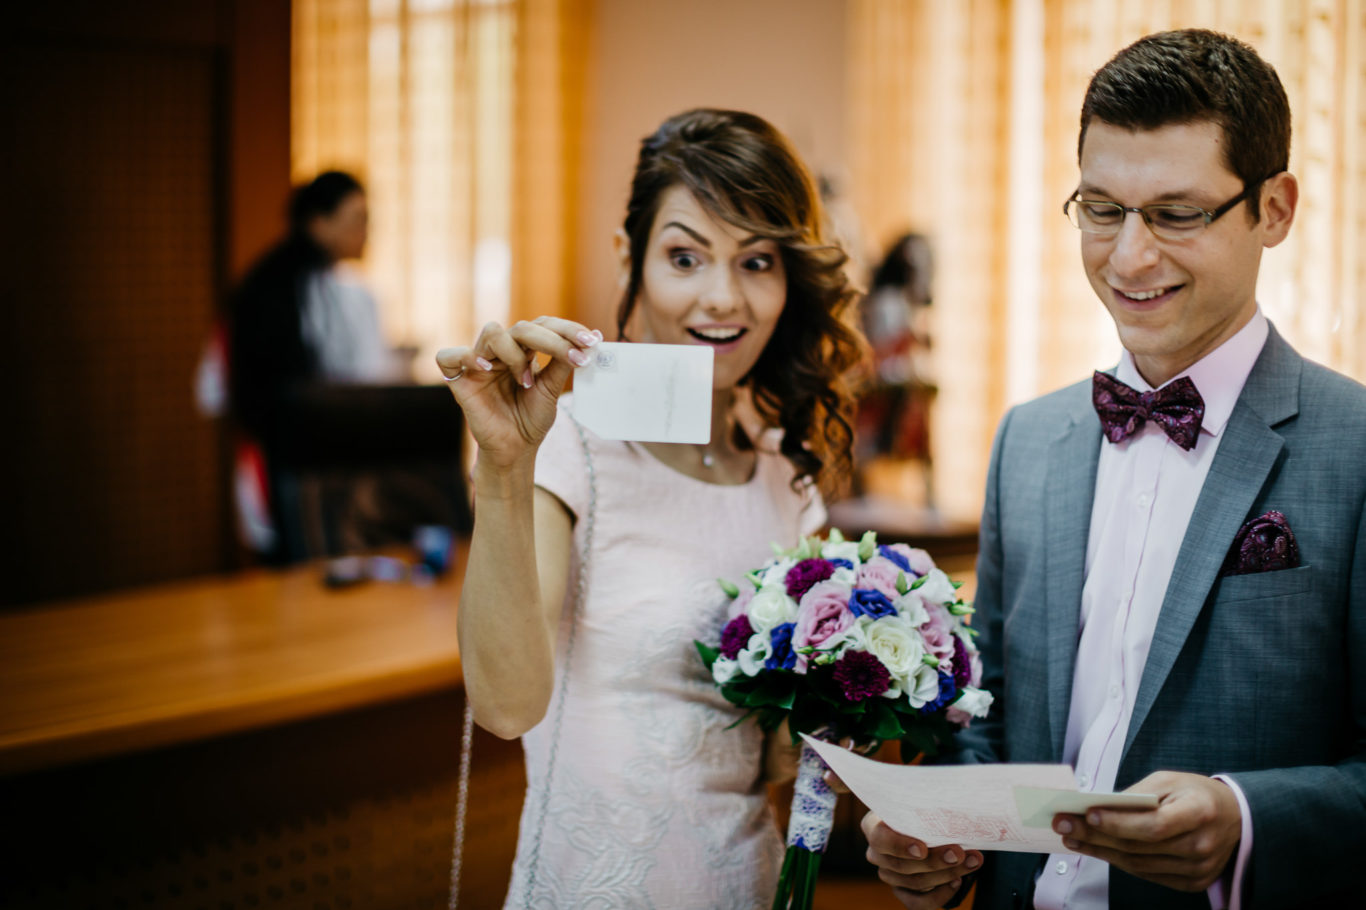 0061-fotografie-nunta-bucuresti-dana-radu-fotograf-ciprian-dumitrescu-cd2_6243